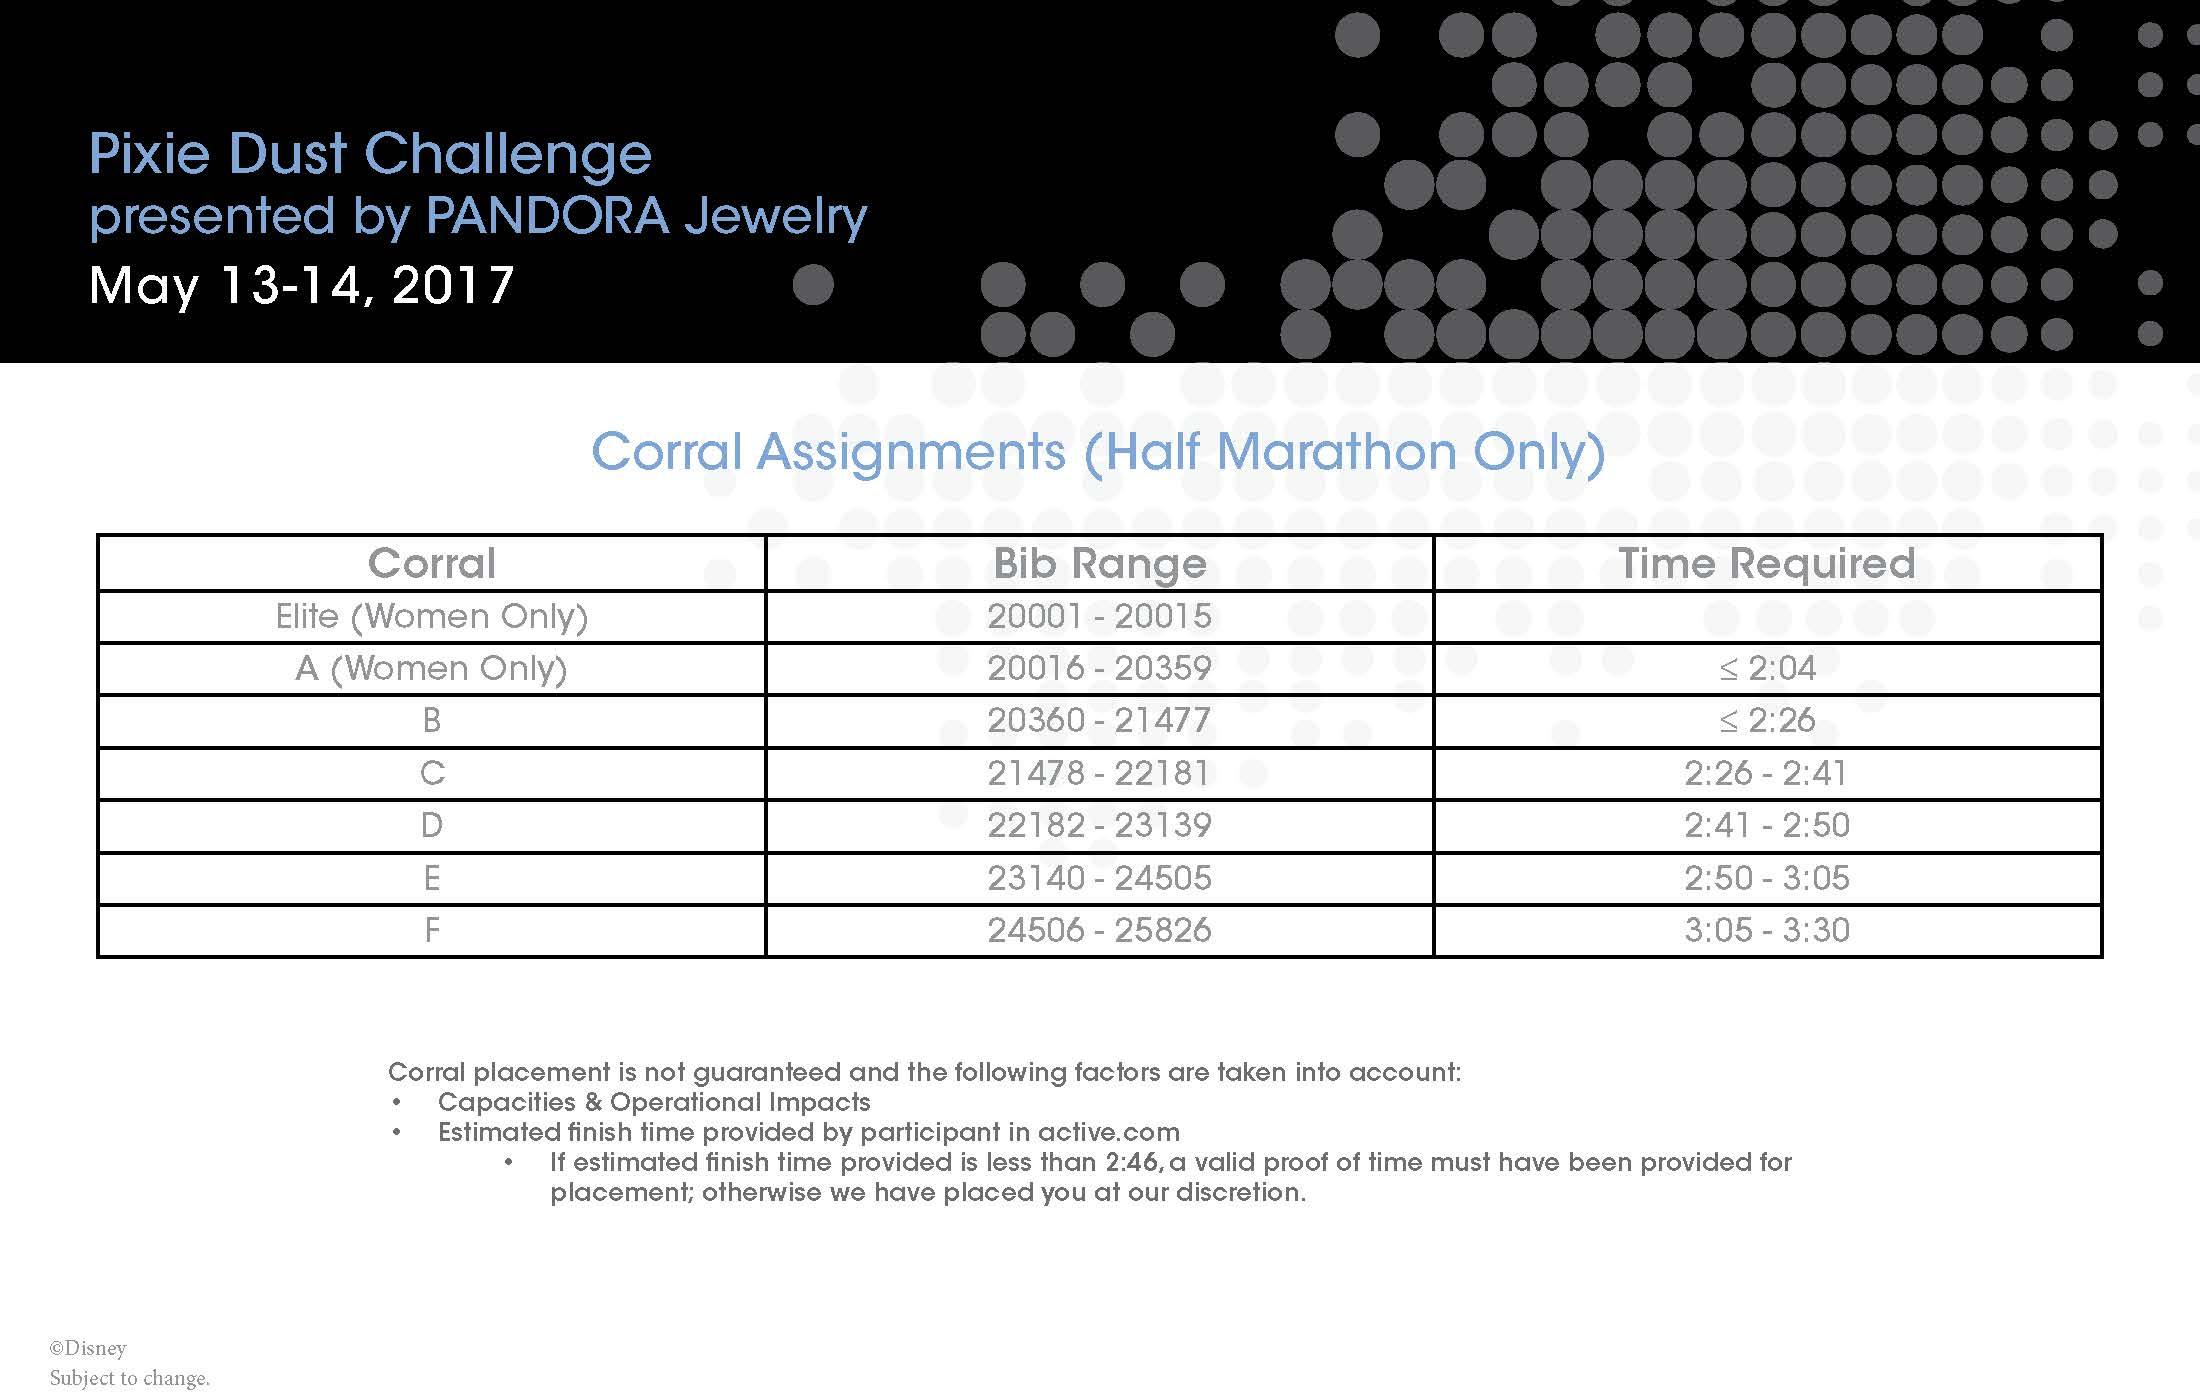 Pixie-dust-challenge-corrals